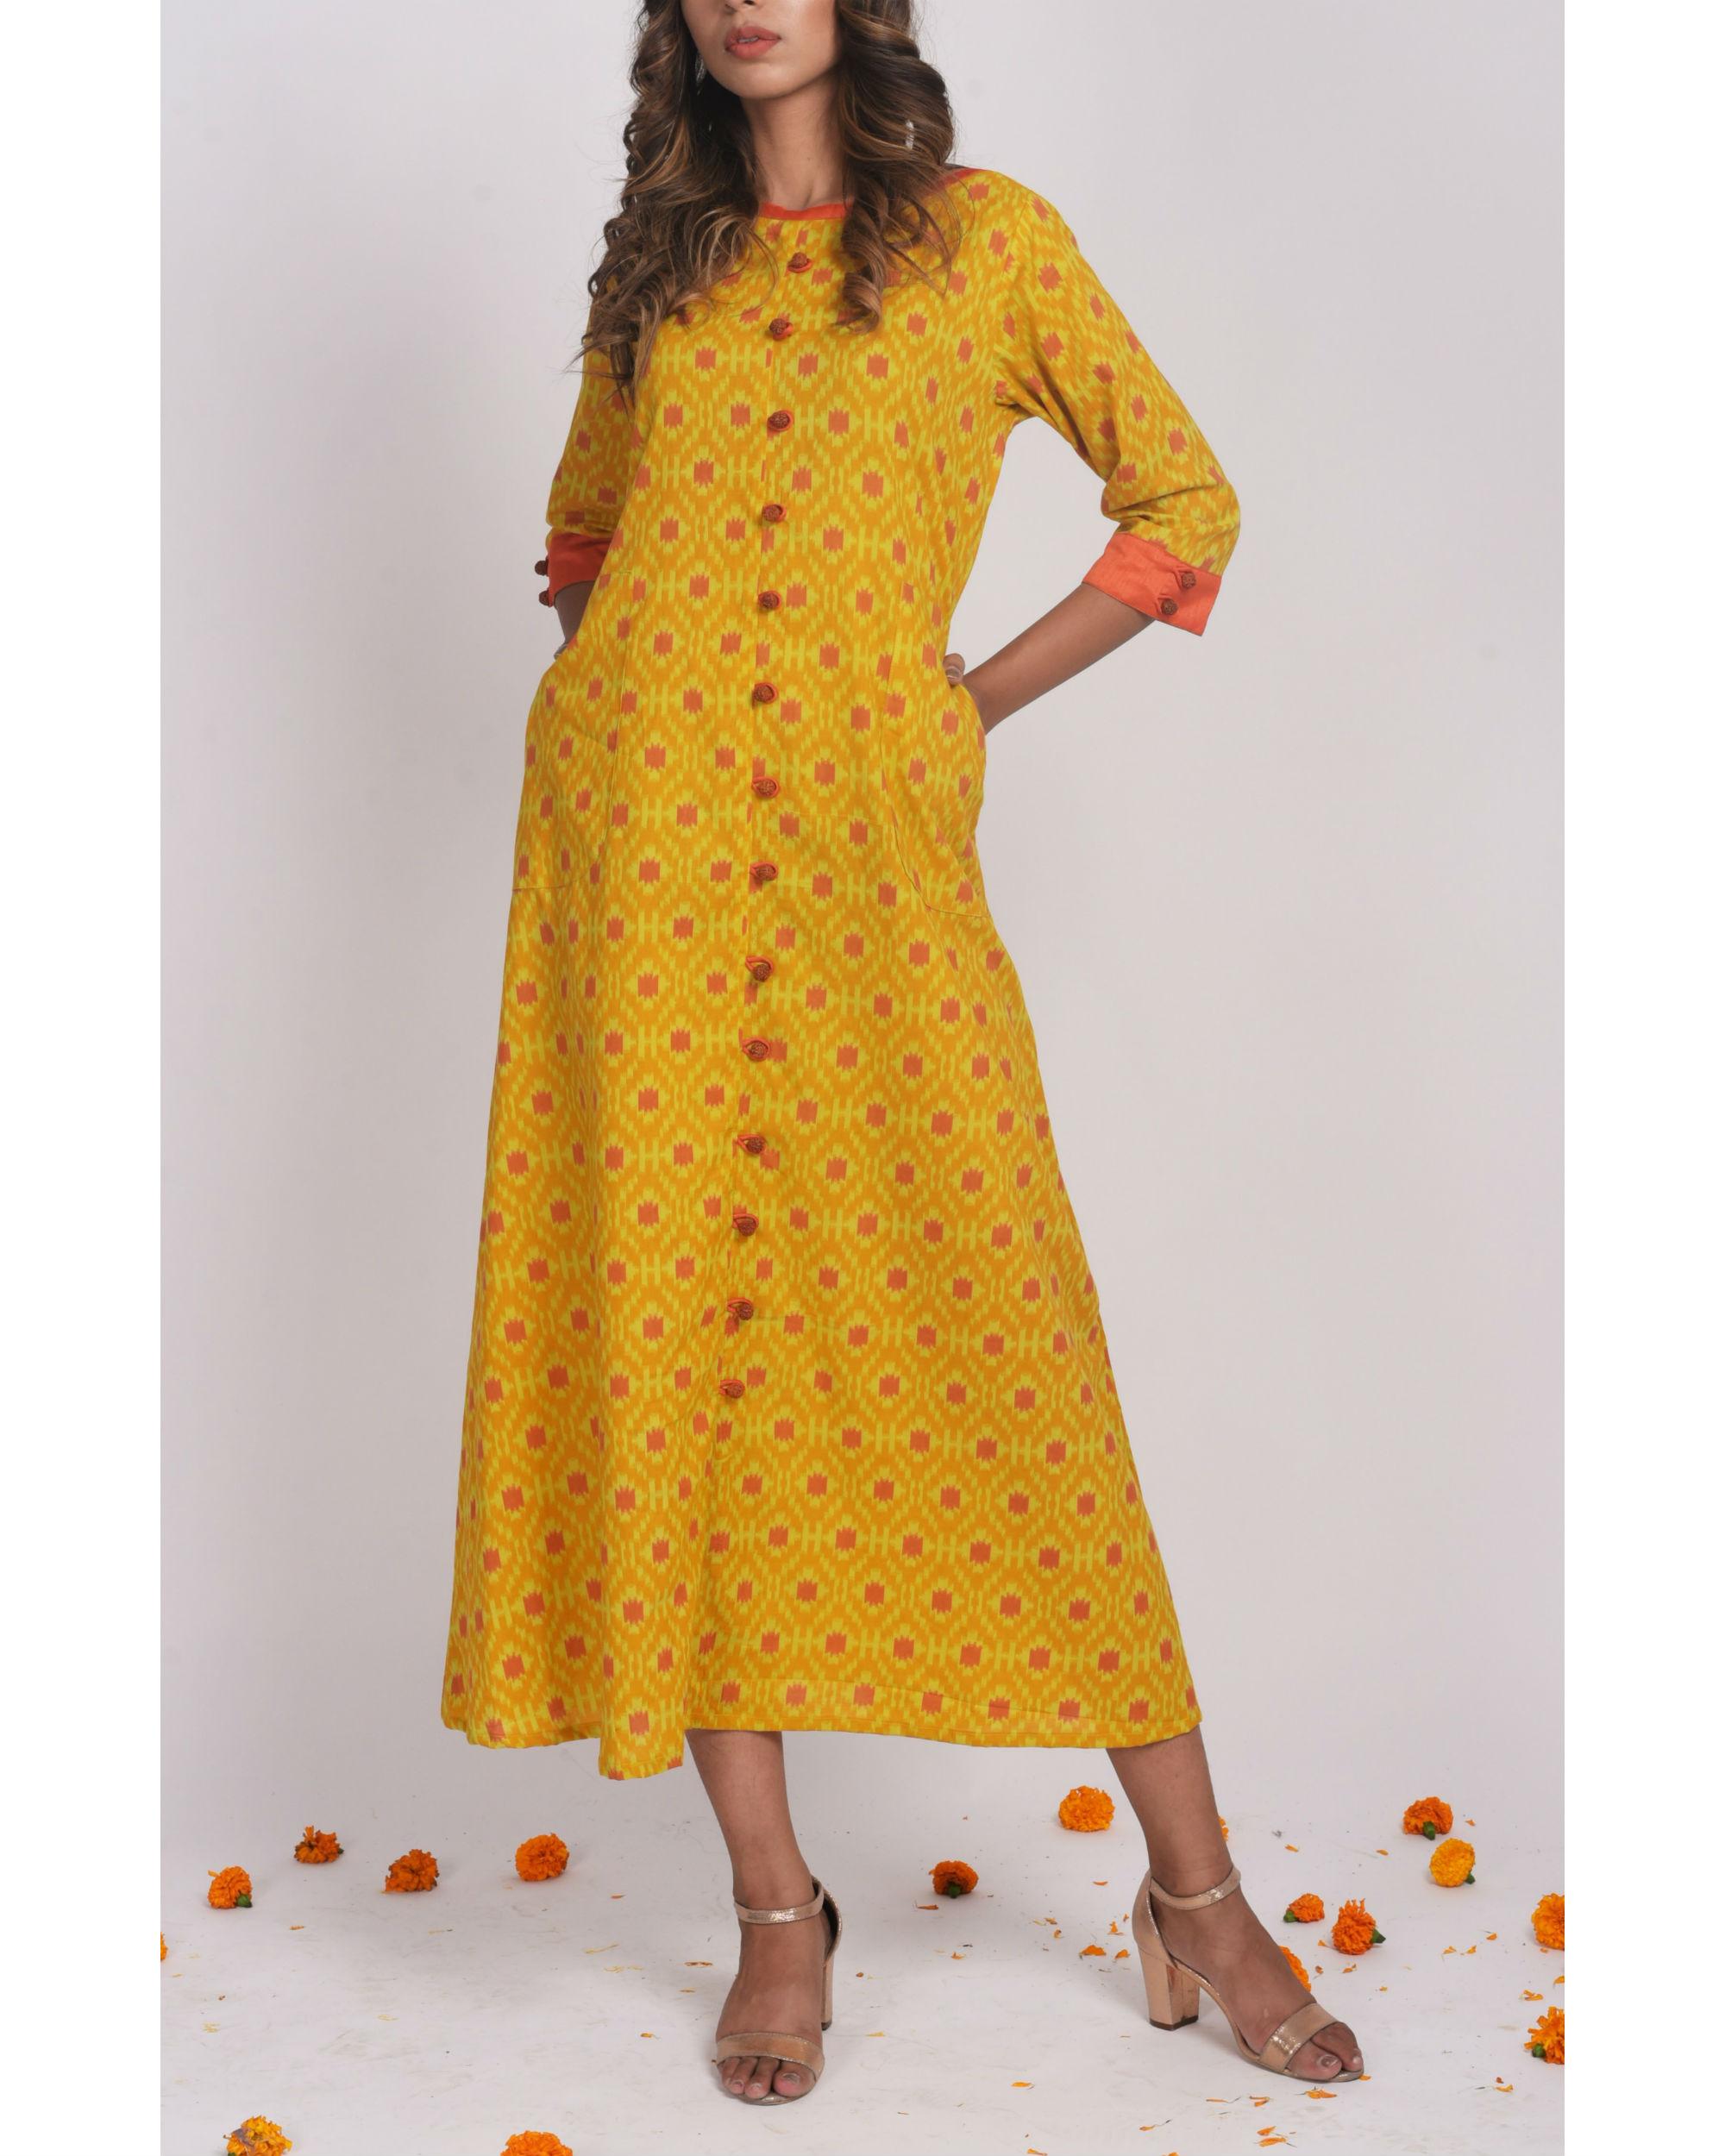 Sunshine Drama Dress